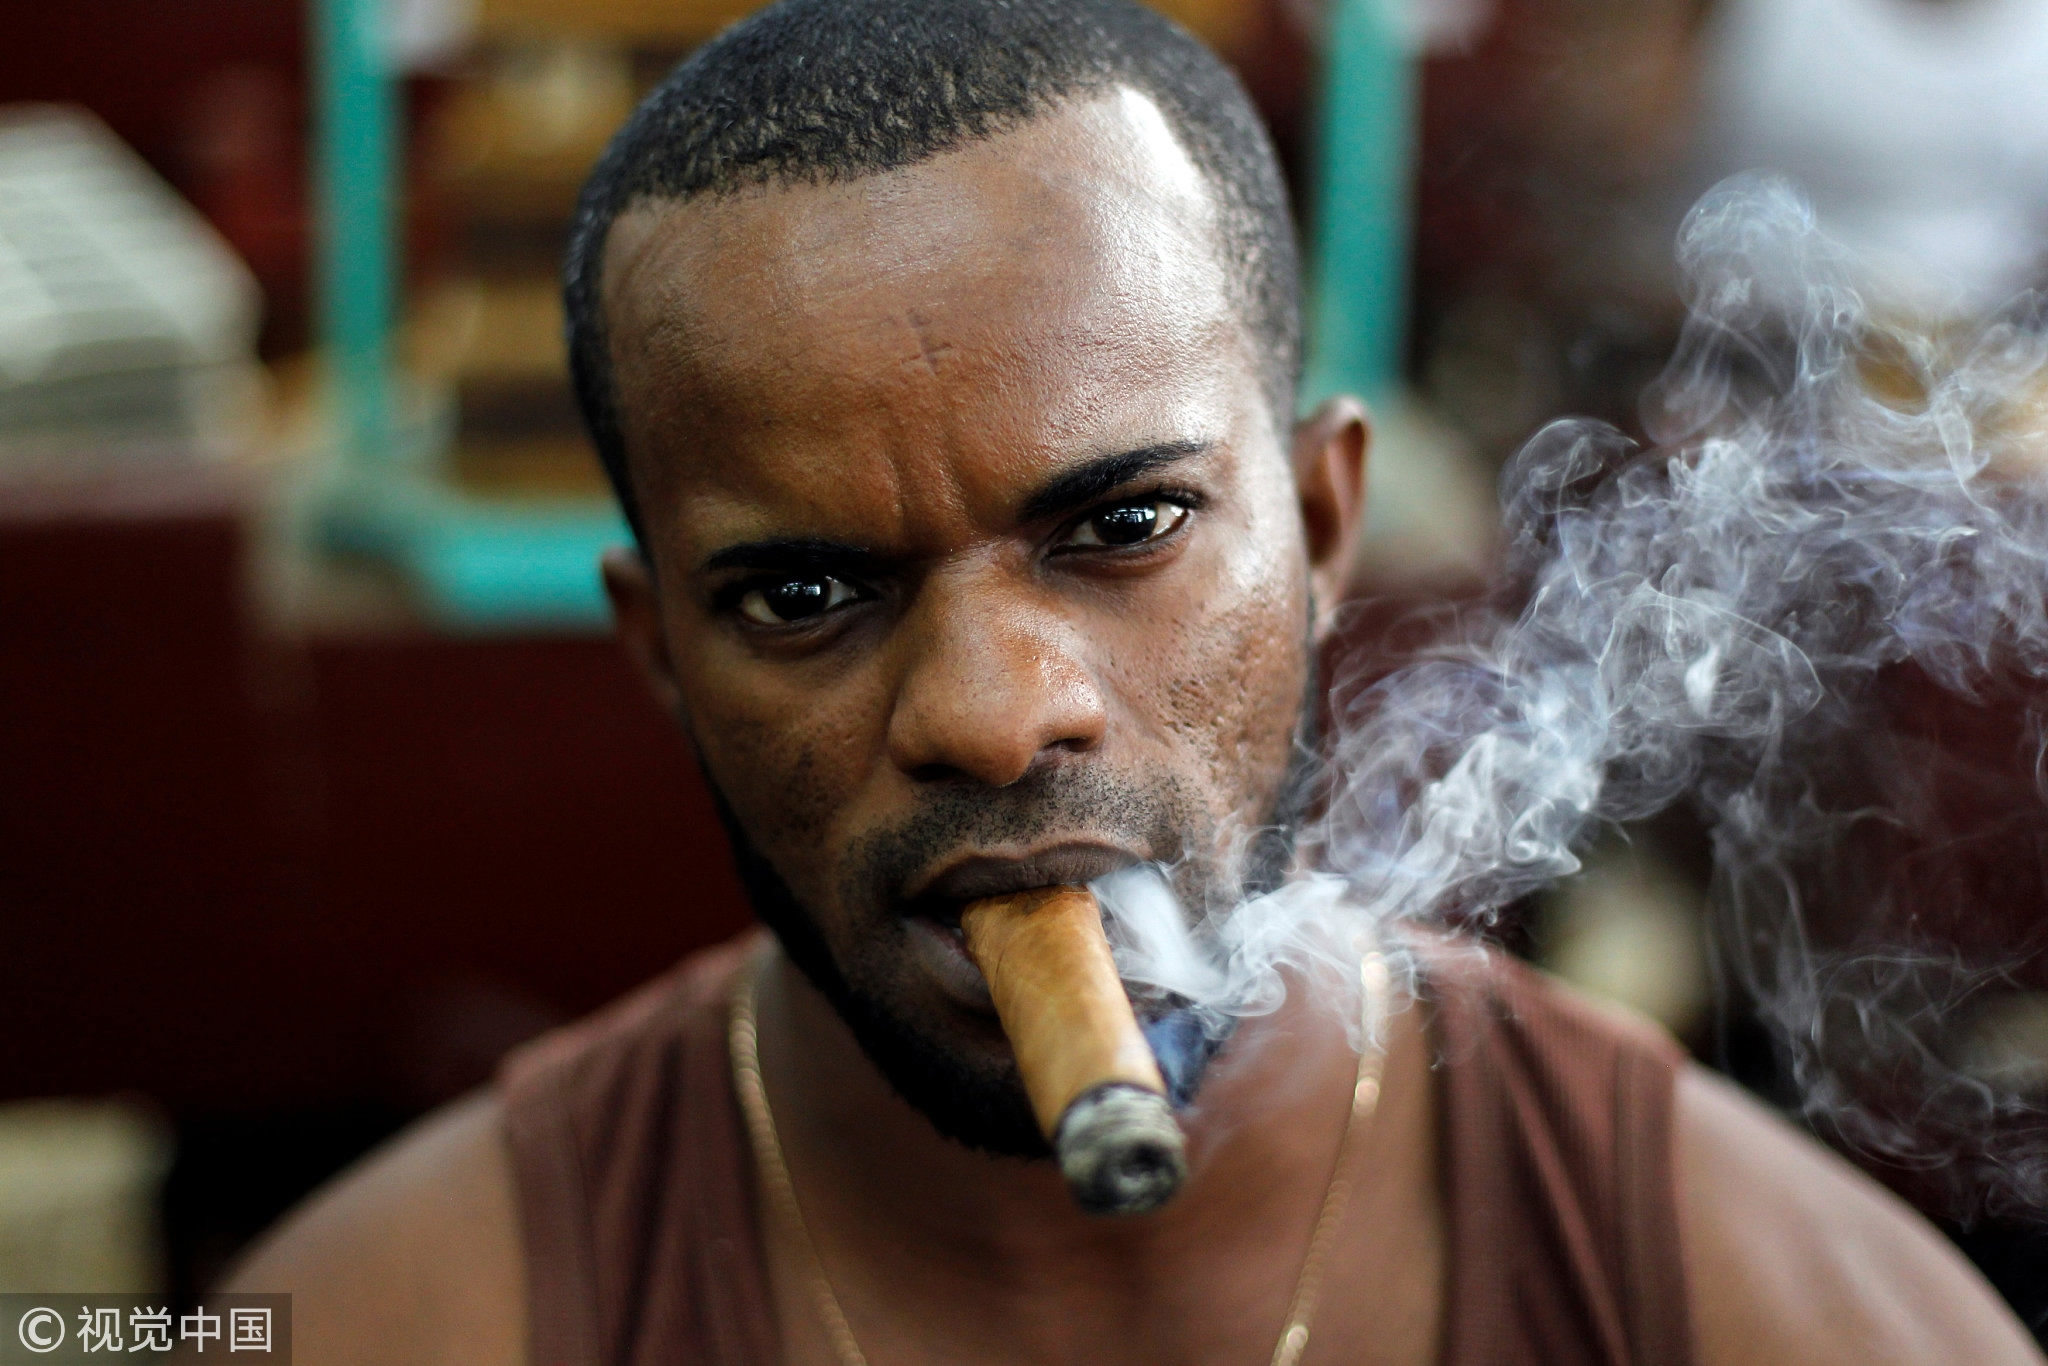 kubai_szivargyartas_kapitalizmus_vagy_halal.jpg